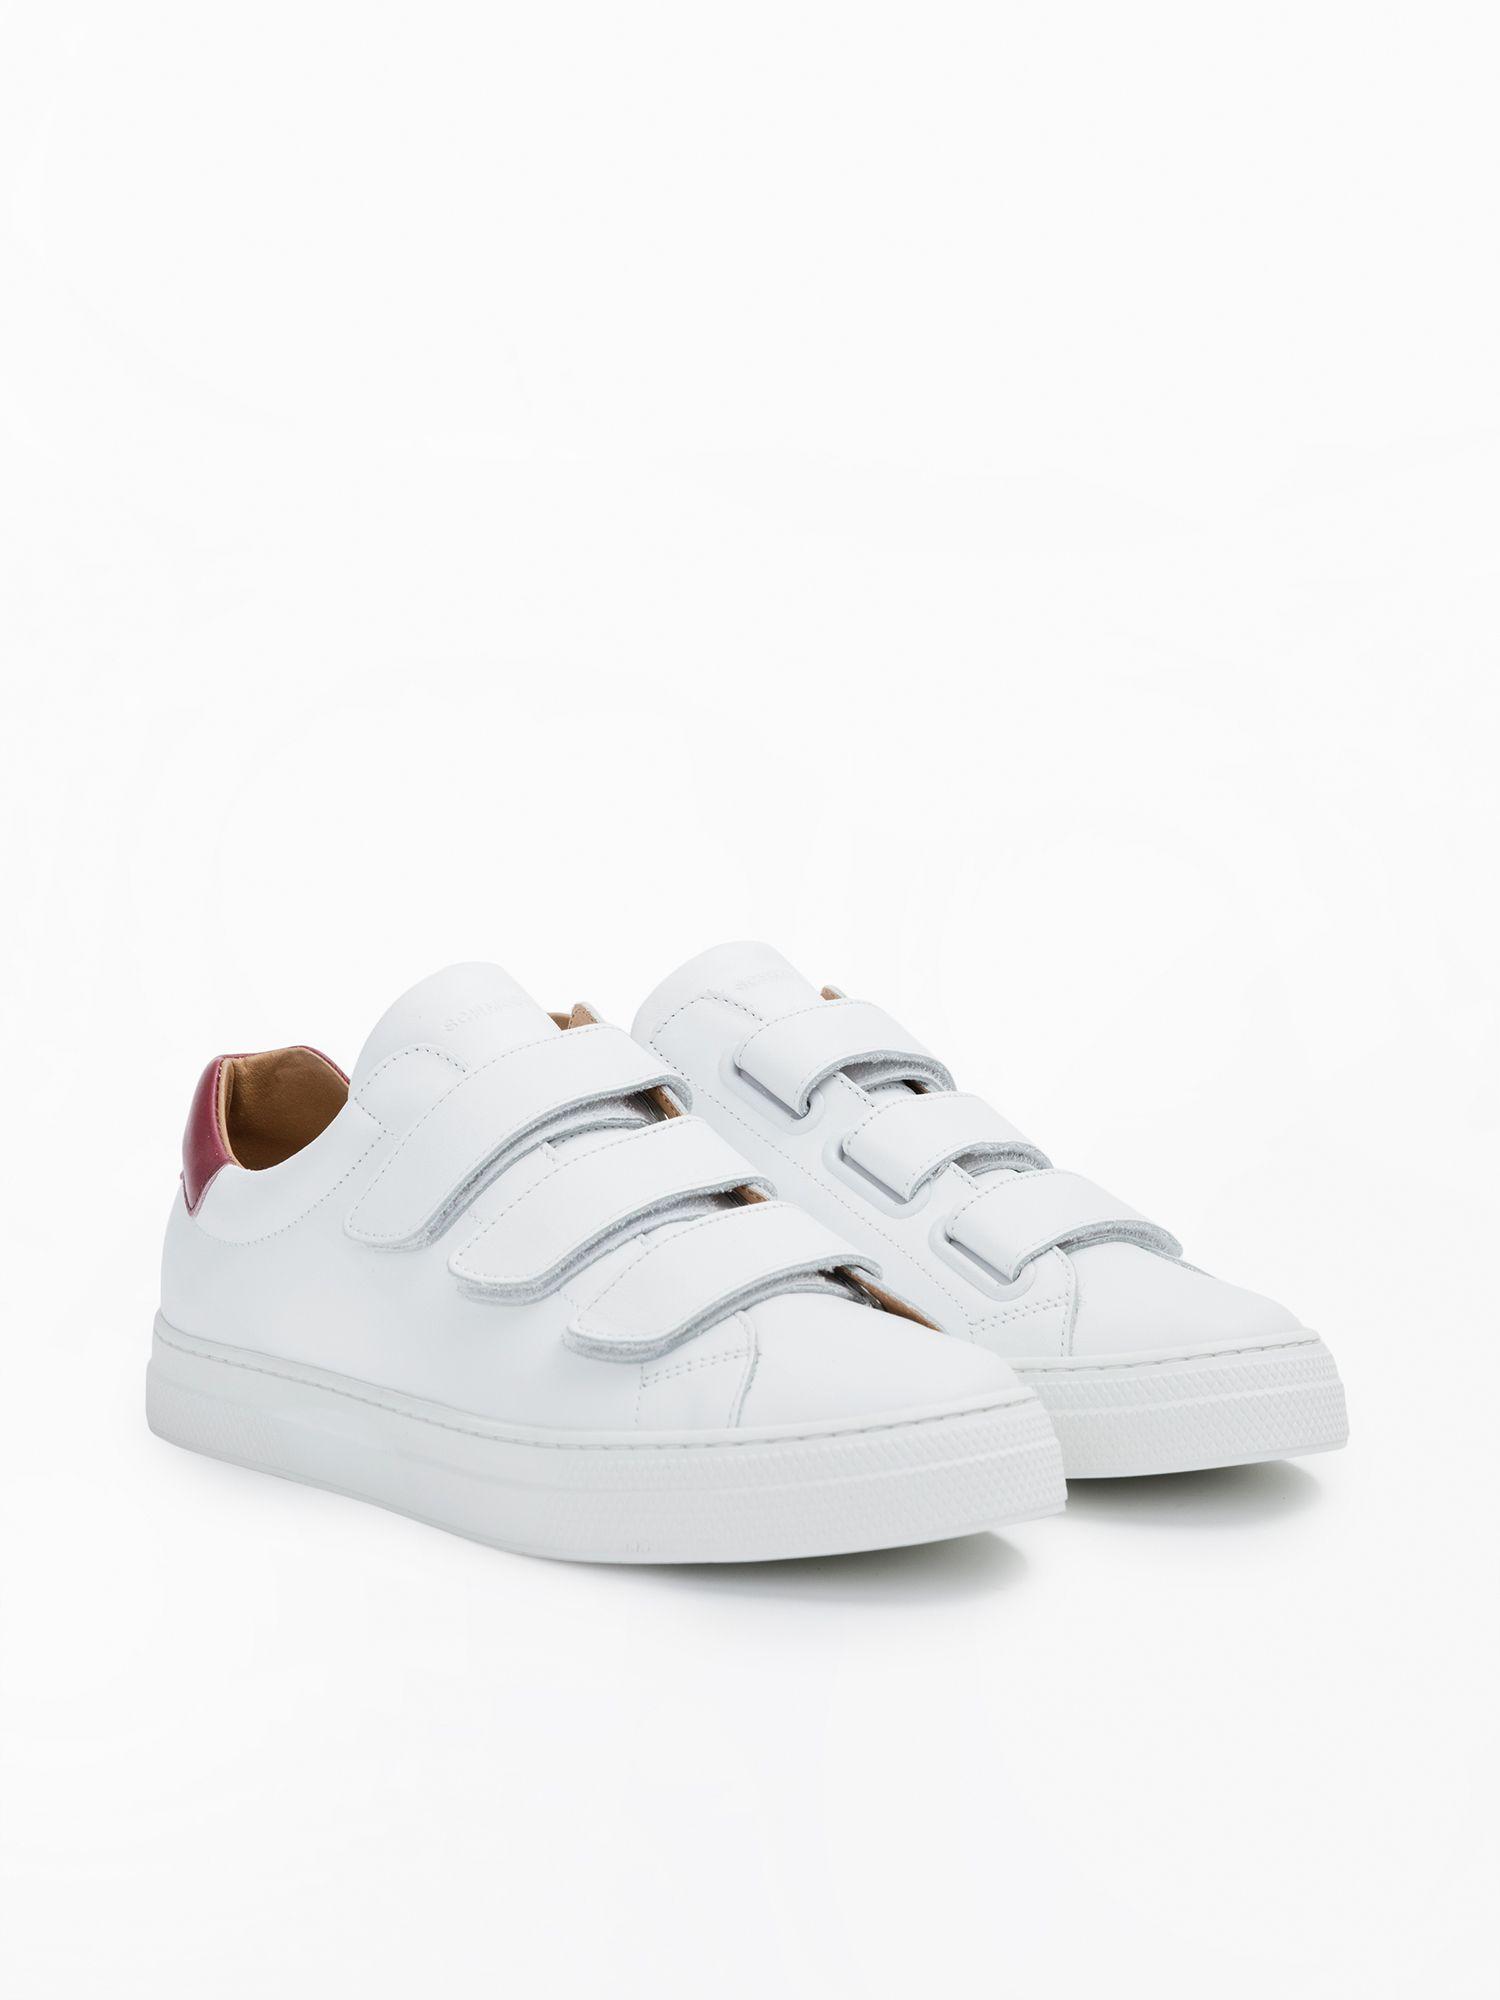 schmoove.fr Spark Free - Nappa/Nappa - White/Red